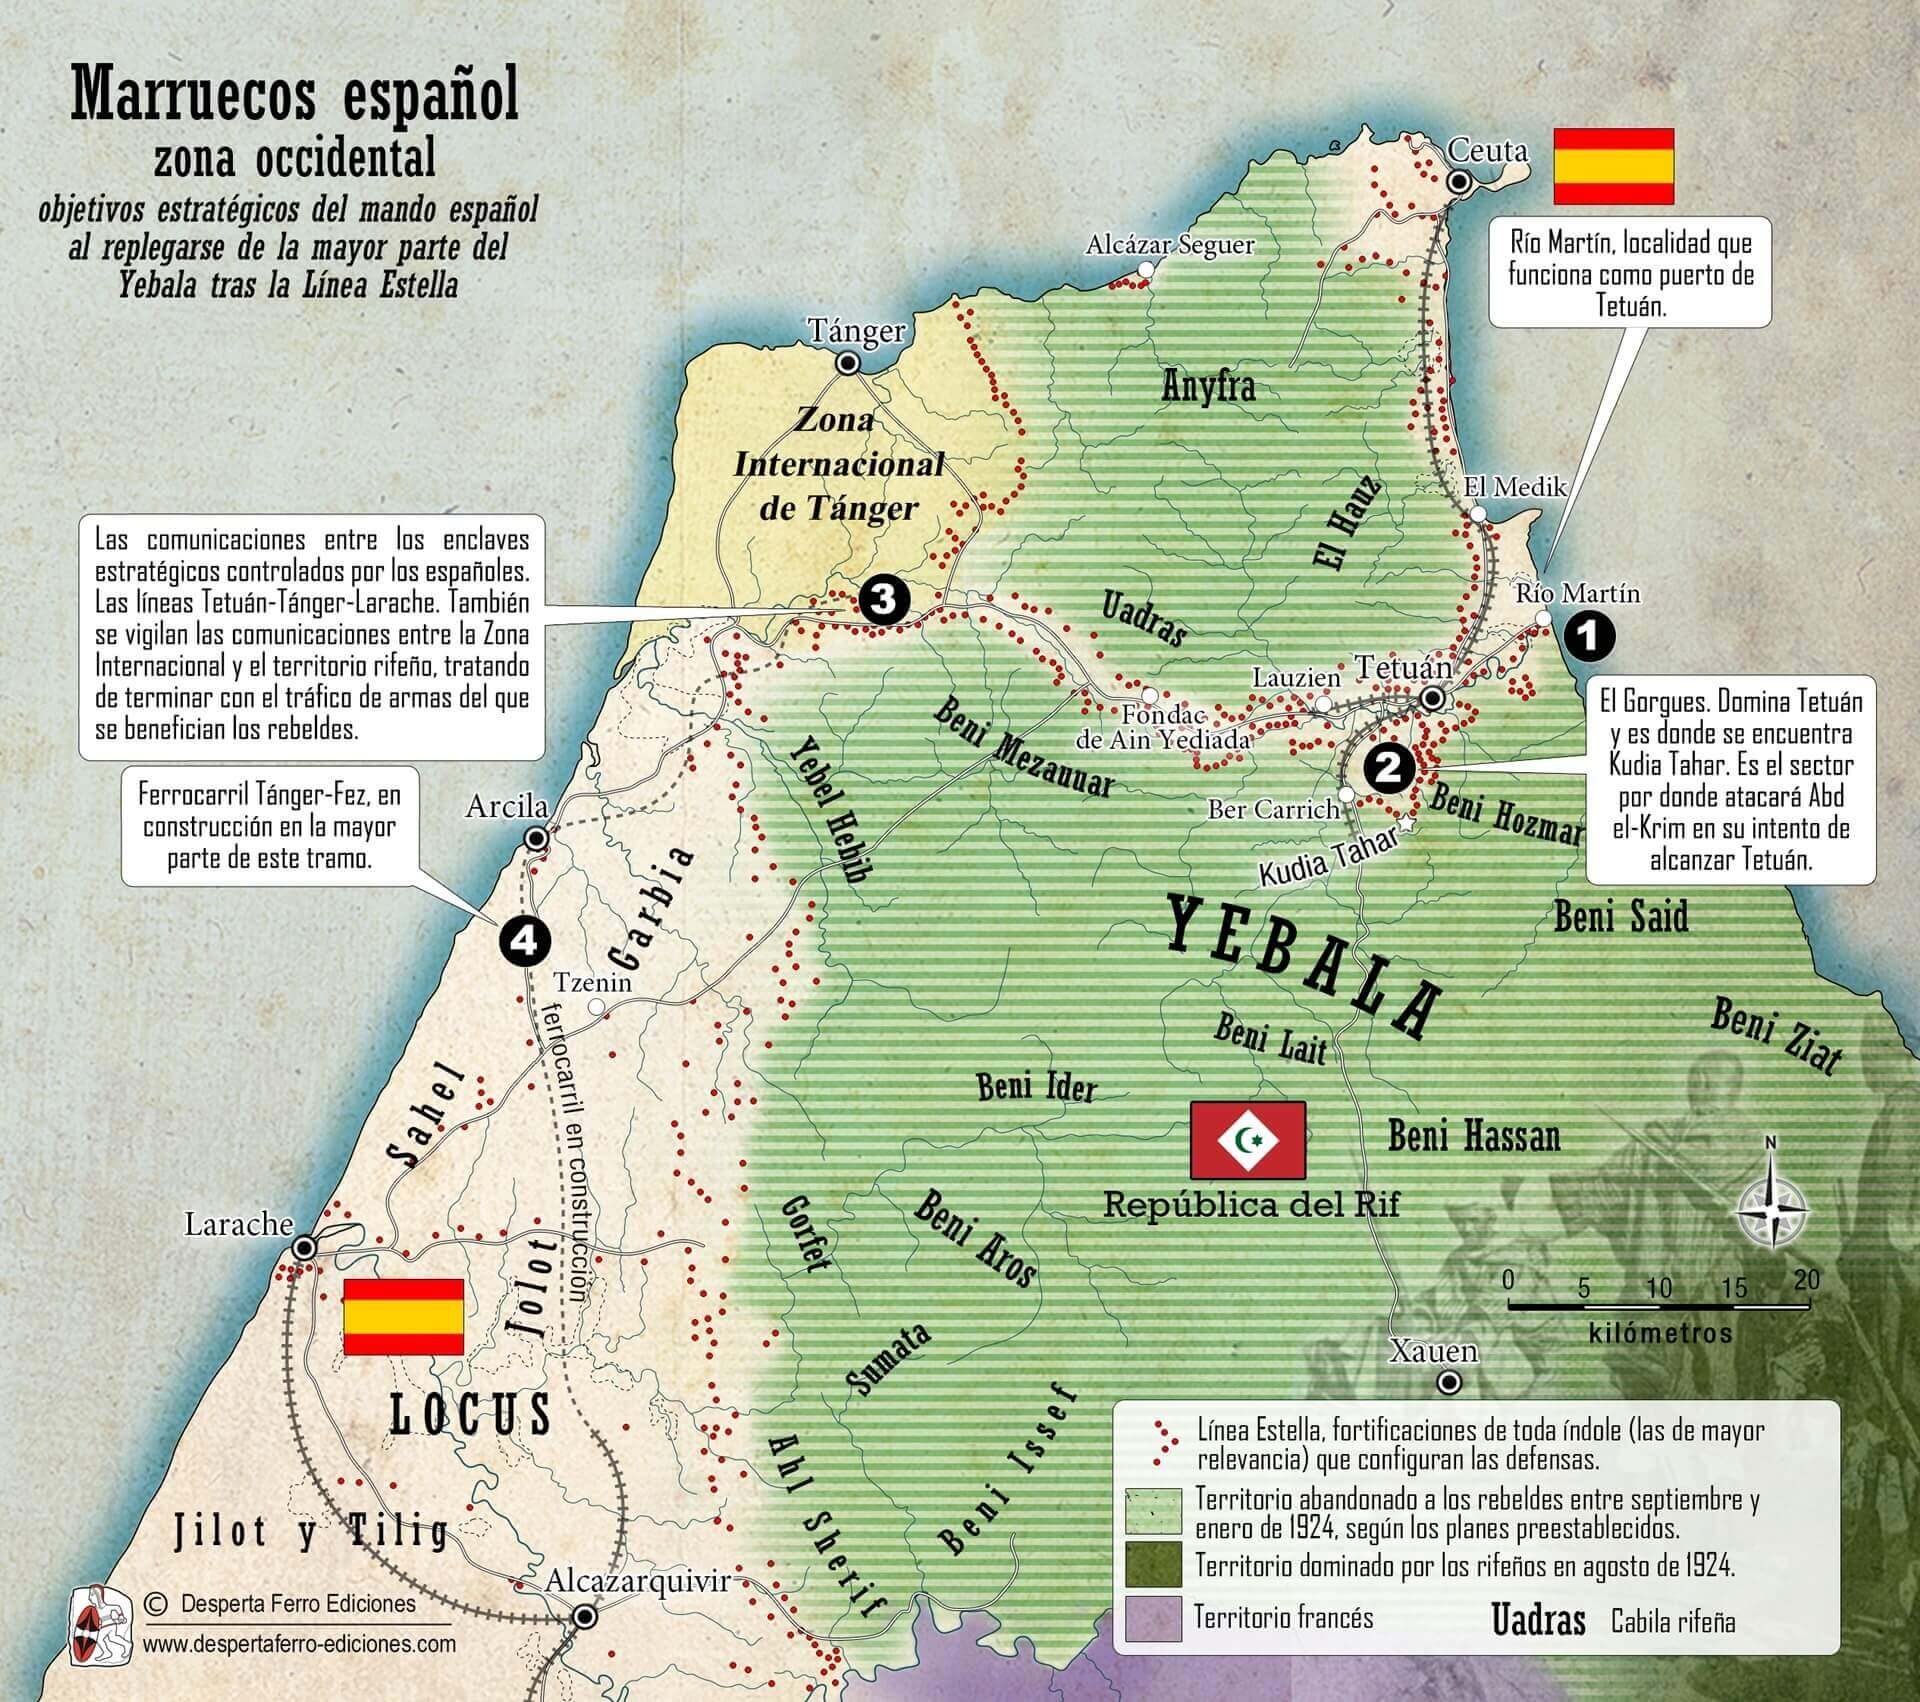 Mapa Marruecos español